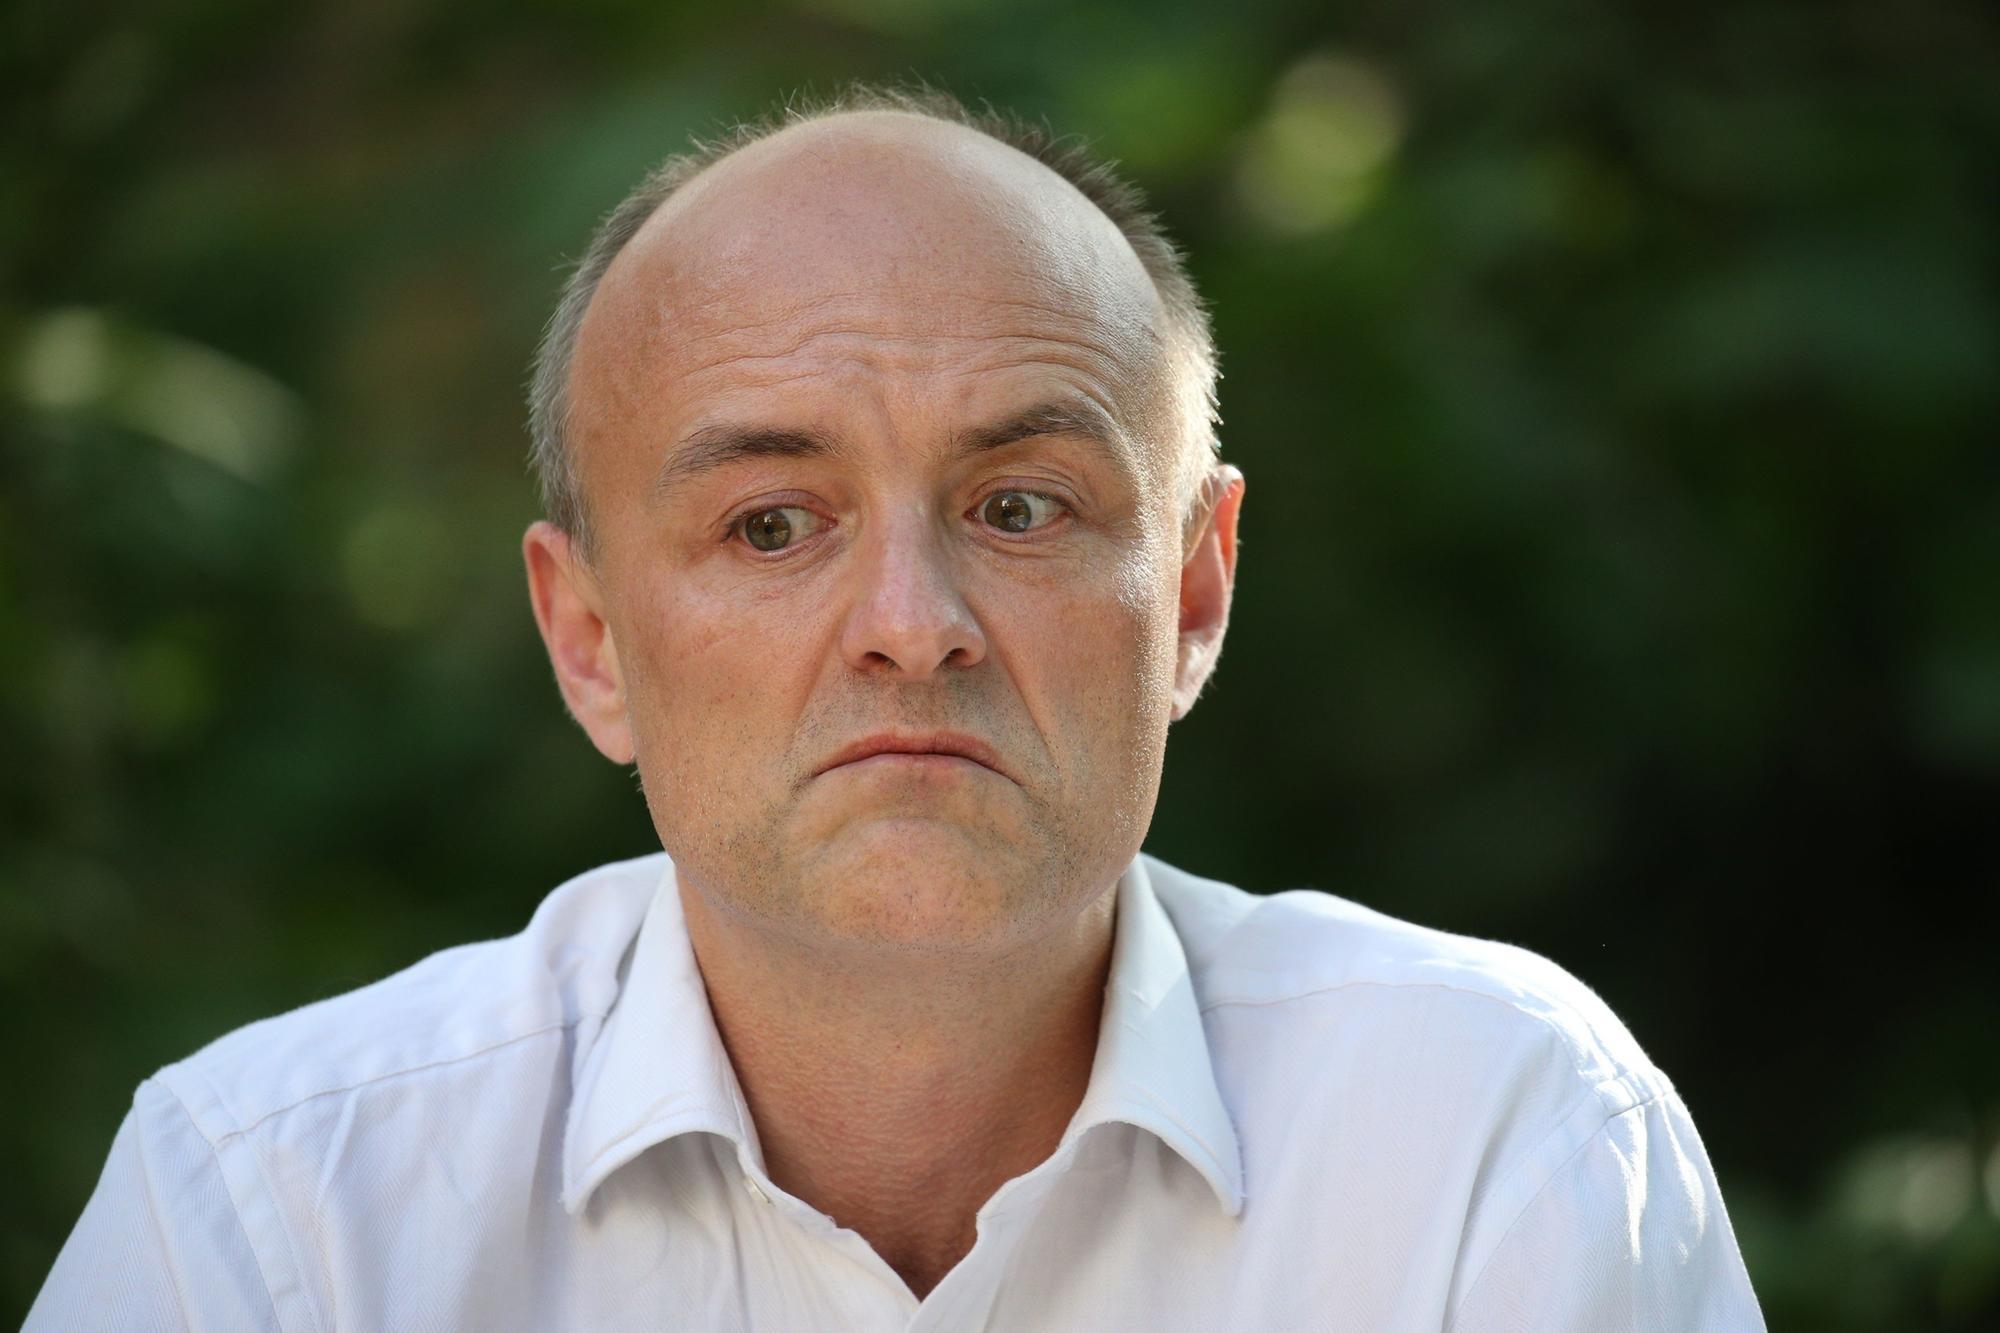 Dominic Cummings: Boris Johnson's chief adviser to leave job 'by Christmas' | The Scotsman